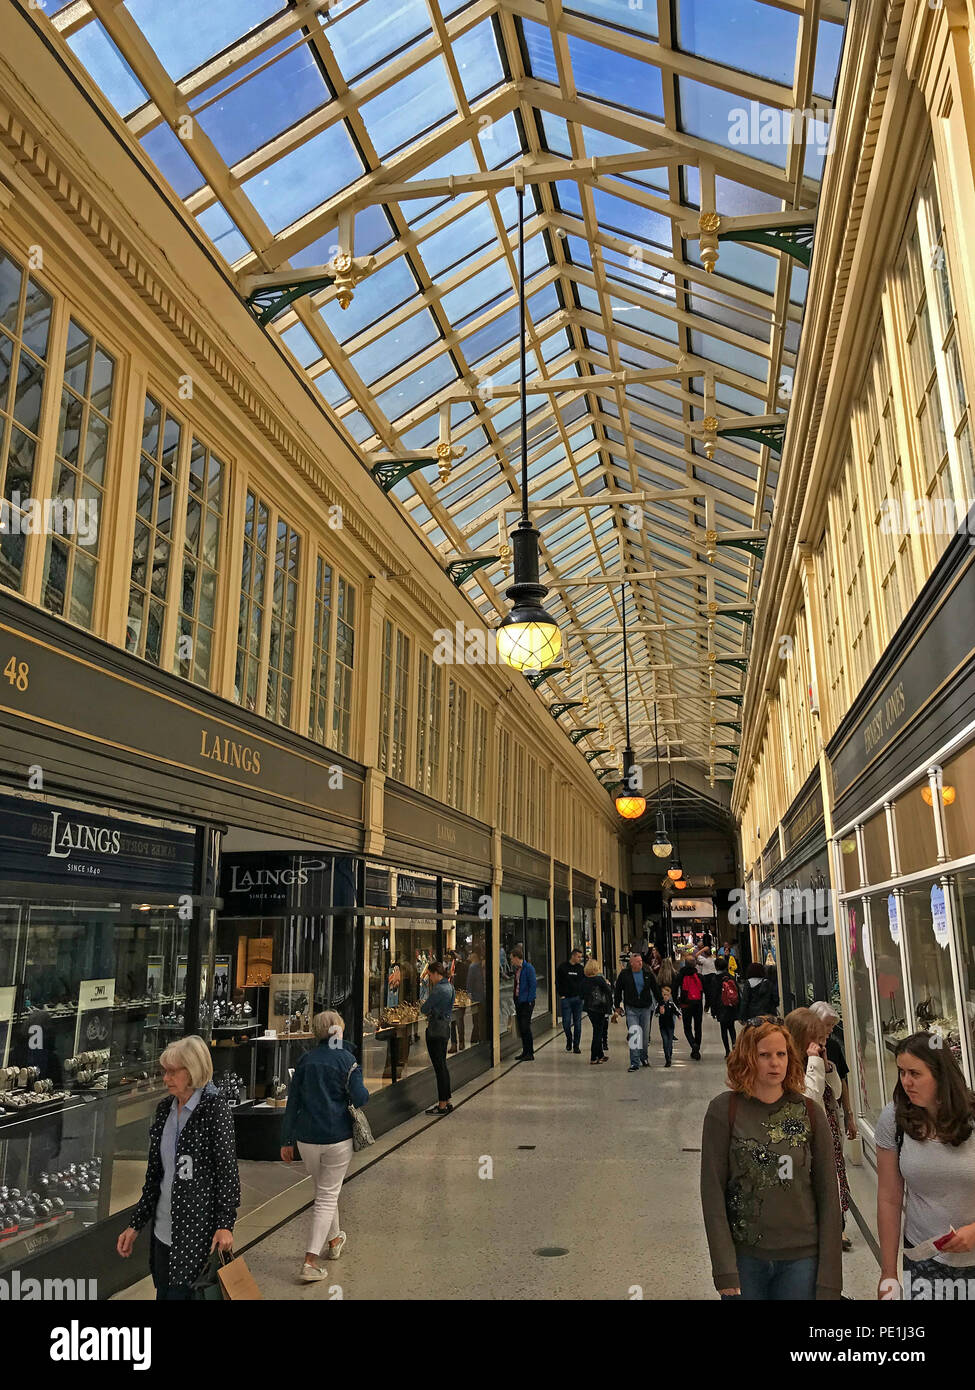 Argyll Arcade, Argyll Street, Glasgow, Strathcylde, Scotland, UK - Stock Image